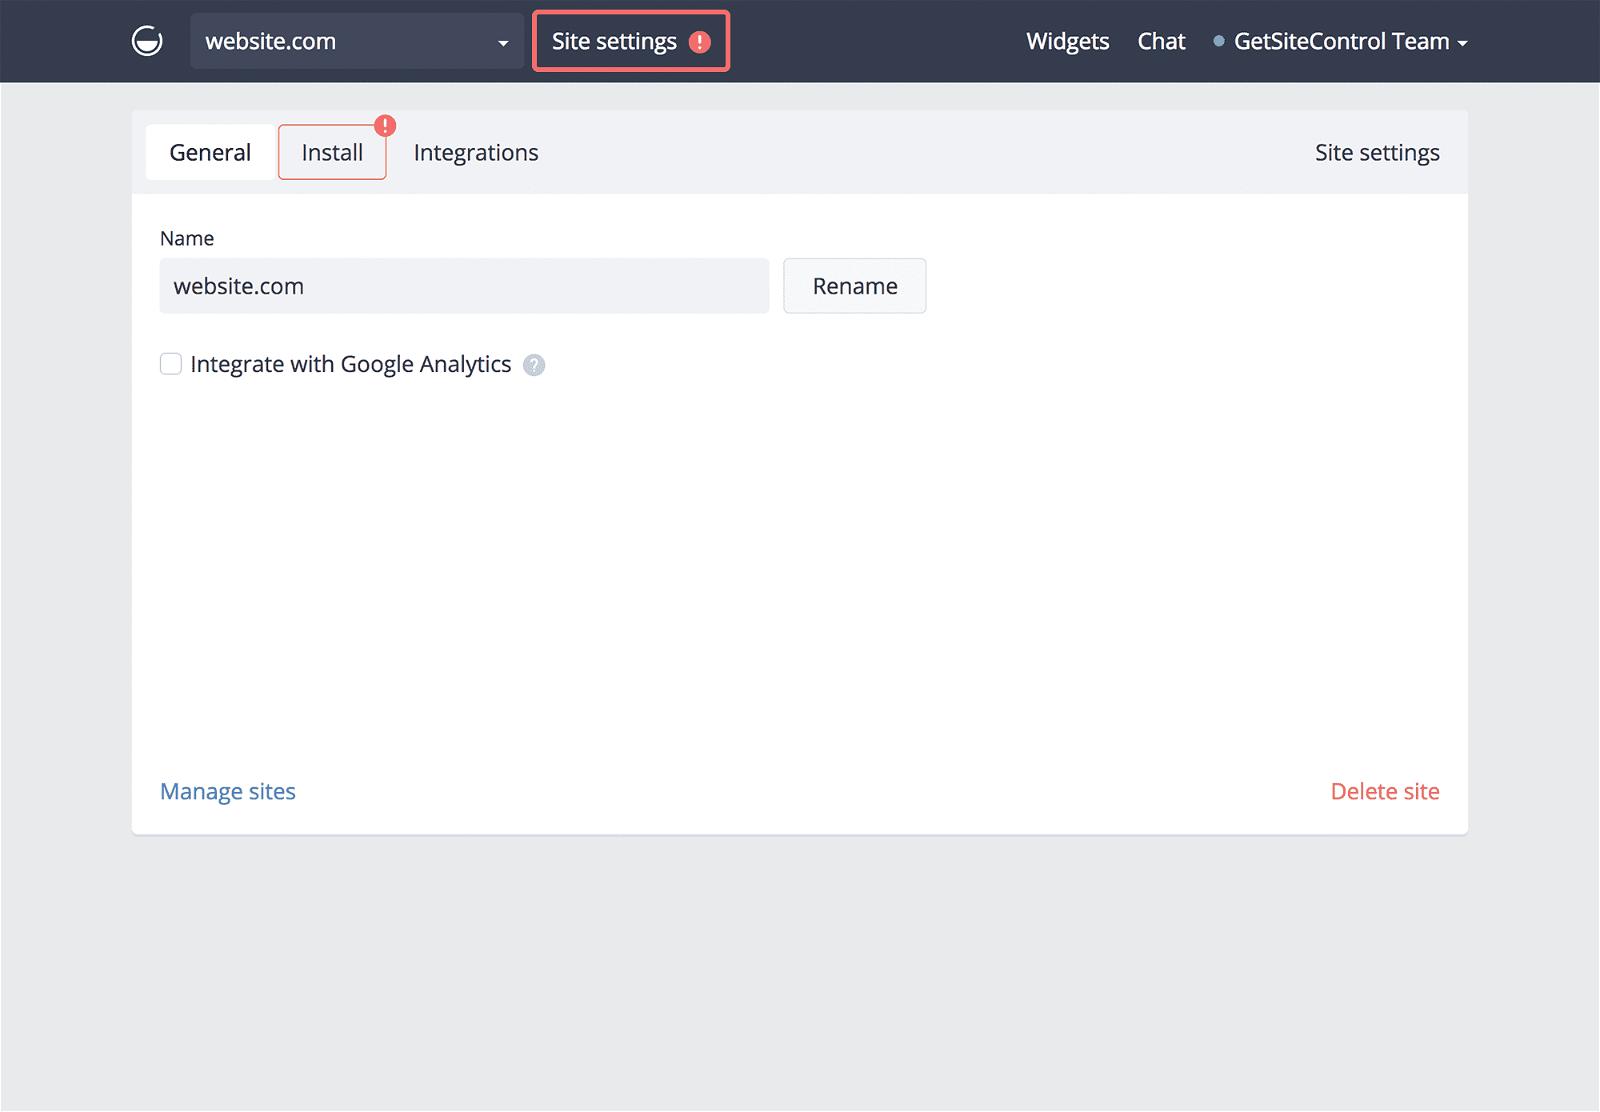 How to install widgets on Squarespace | GetSiteControl